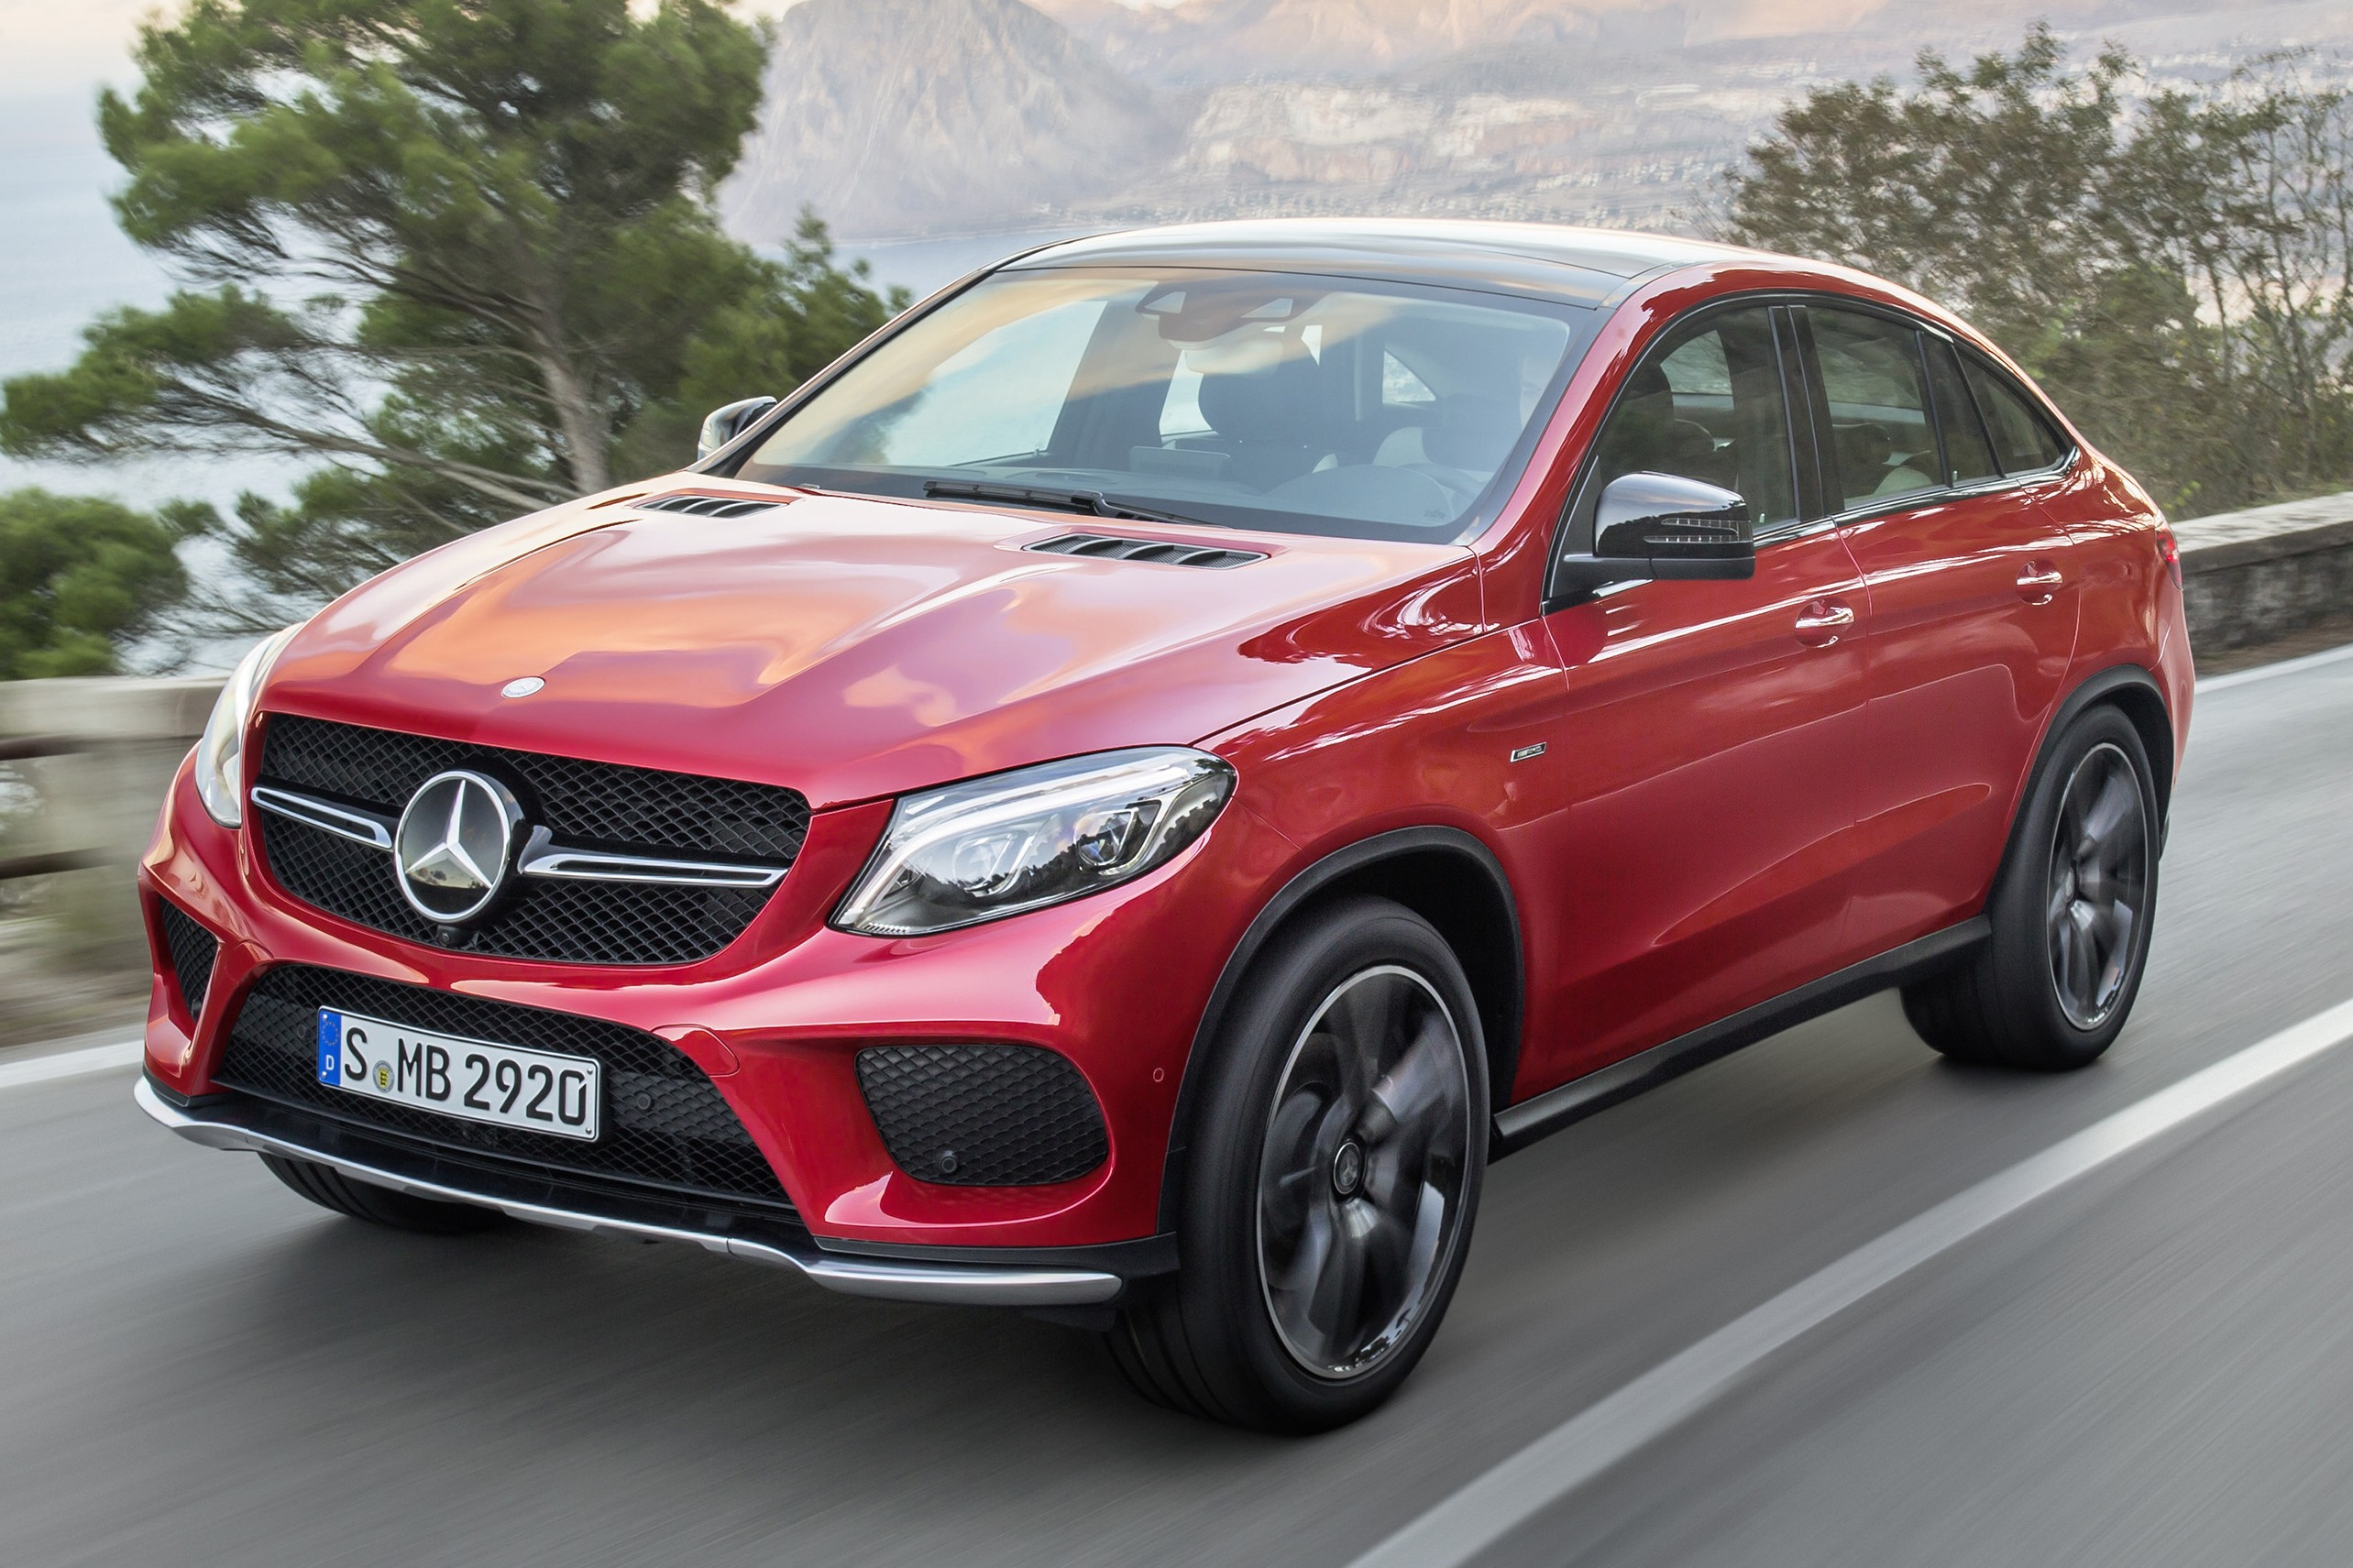 2018 Mercedes Gle >> Mercedes-Benz GLE Coupe: Stuttgart's X6 rival debuts Paul Tan - Image 294949